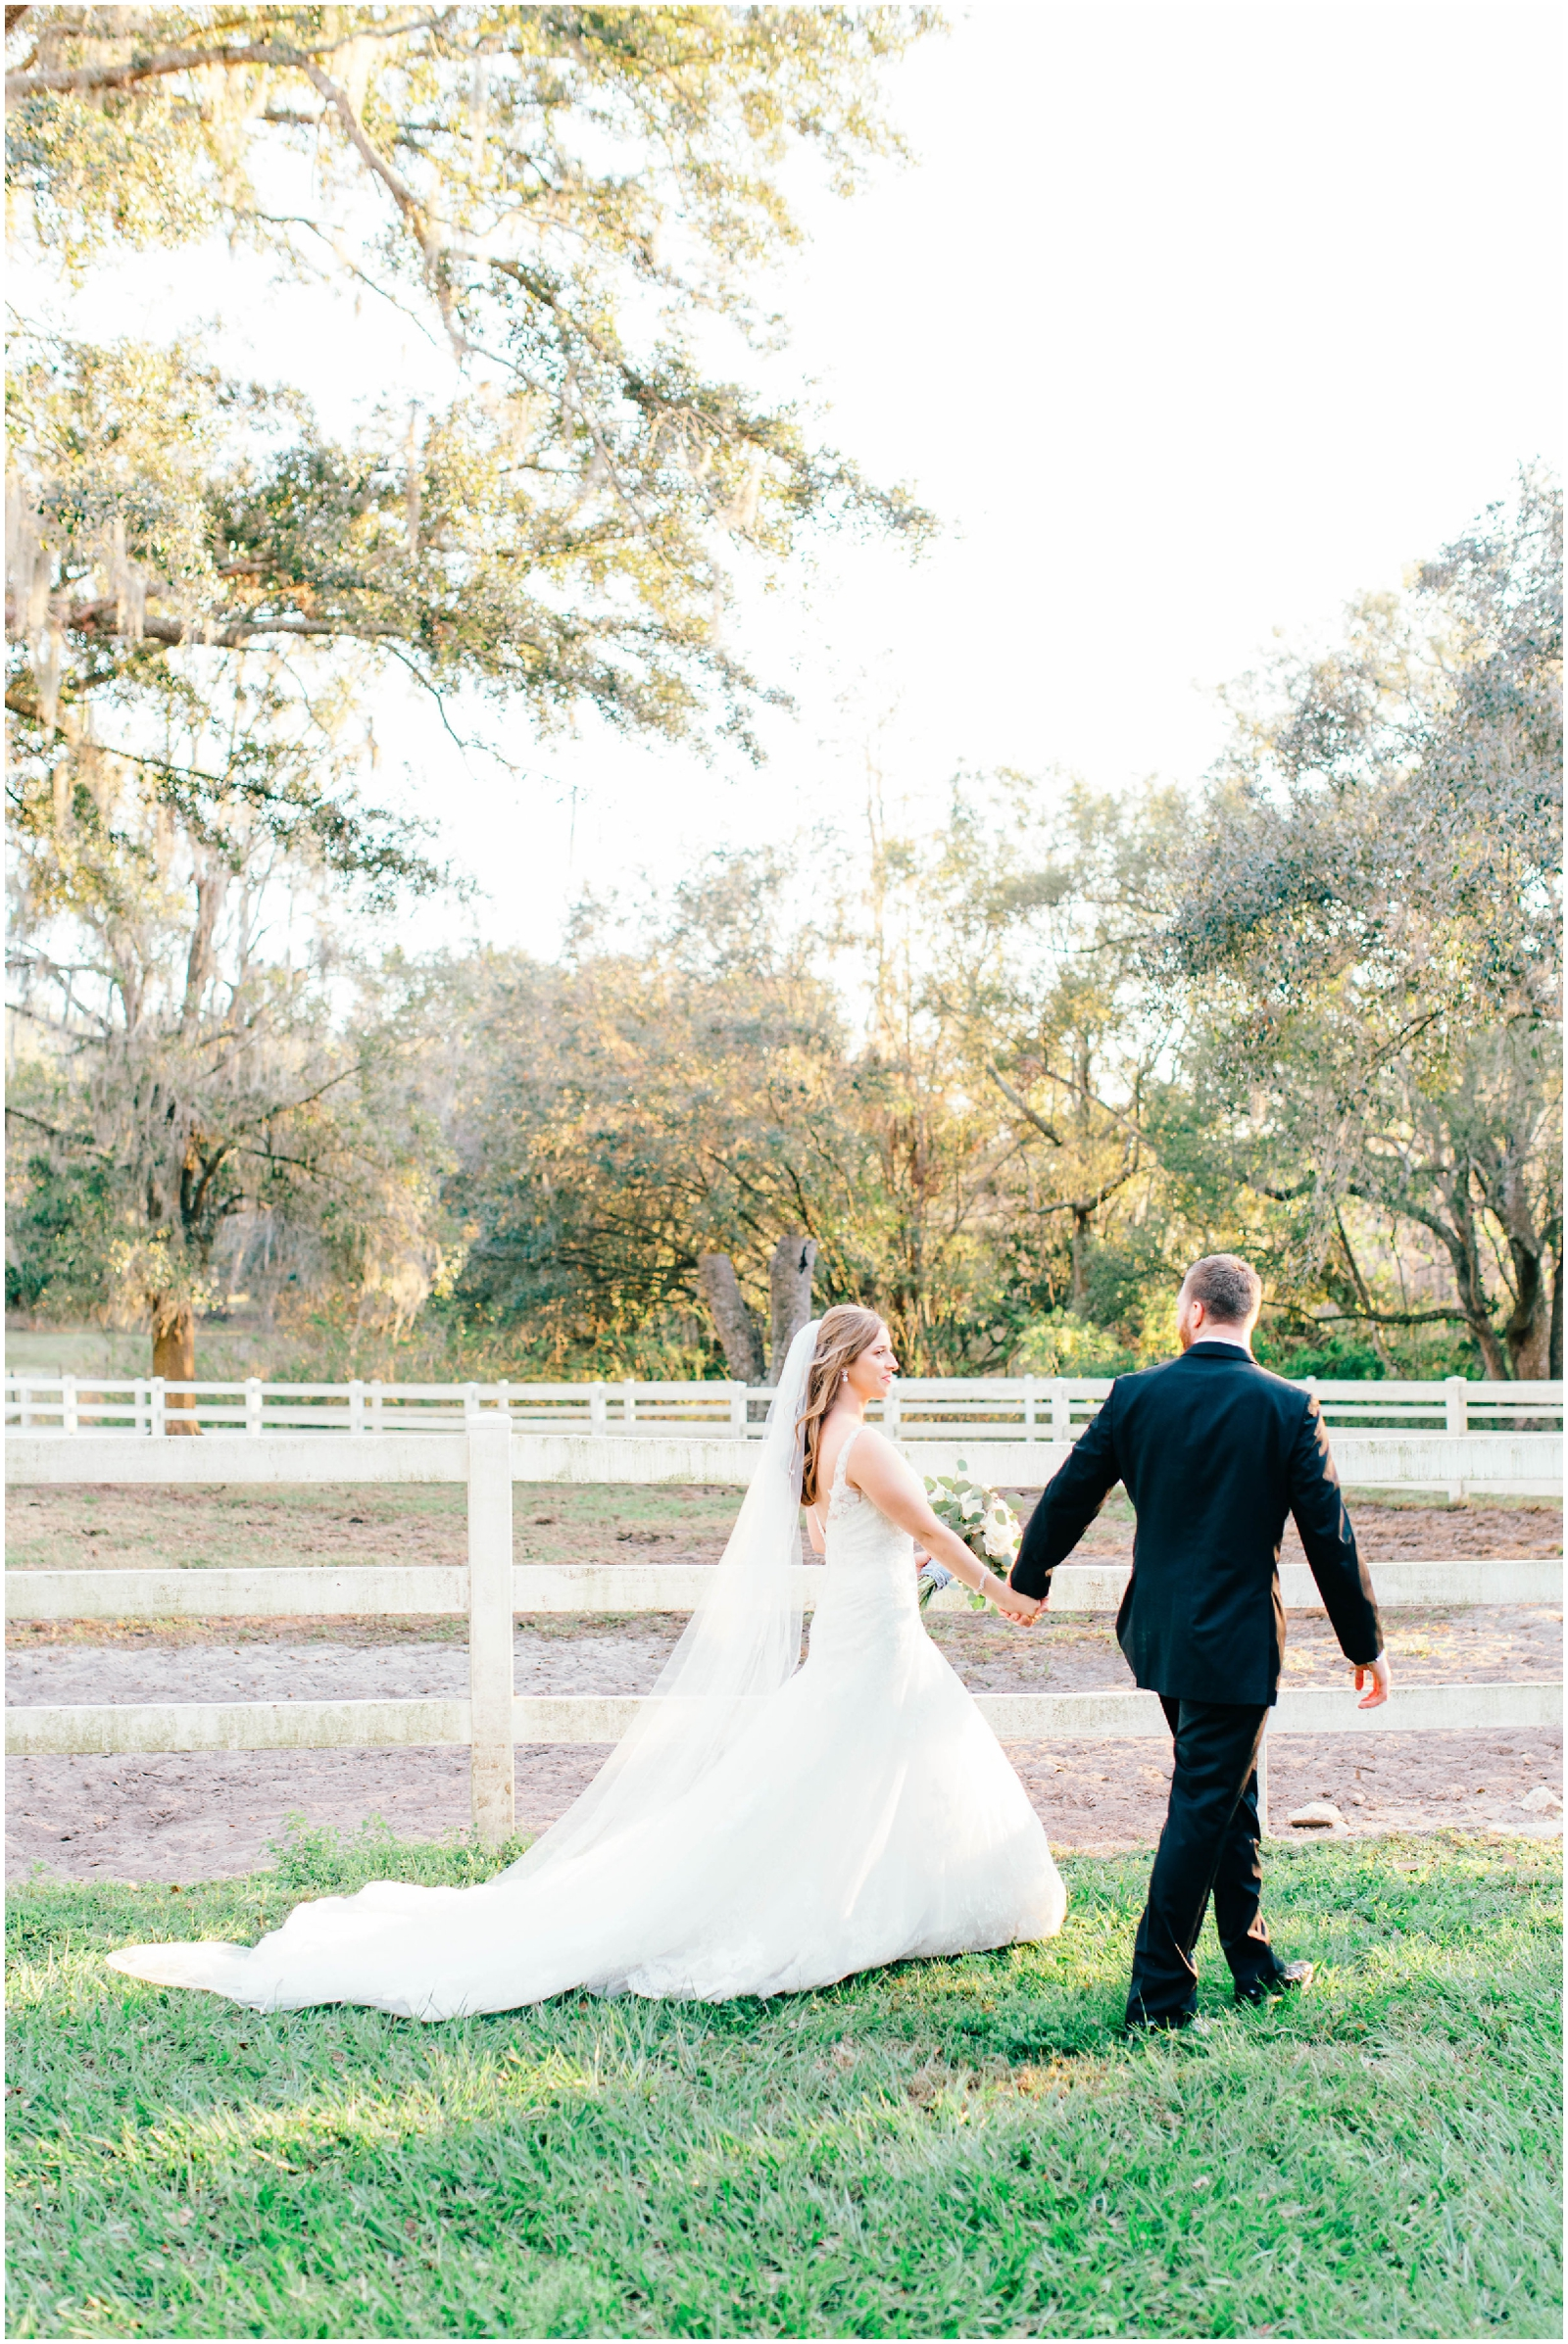 Tampa Area Wedding Venue with Southern Charm- Stonebridge Events_0285.jpg